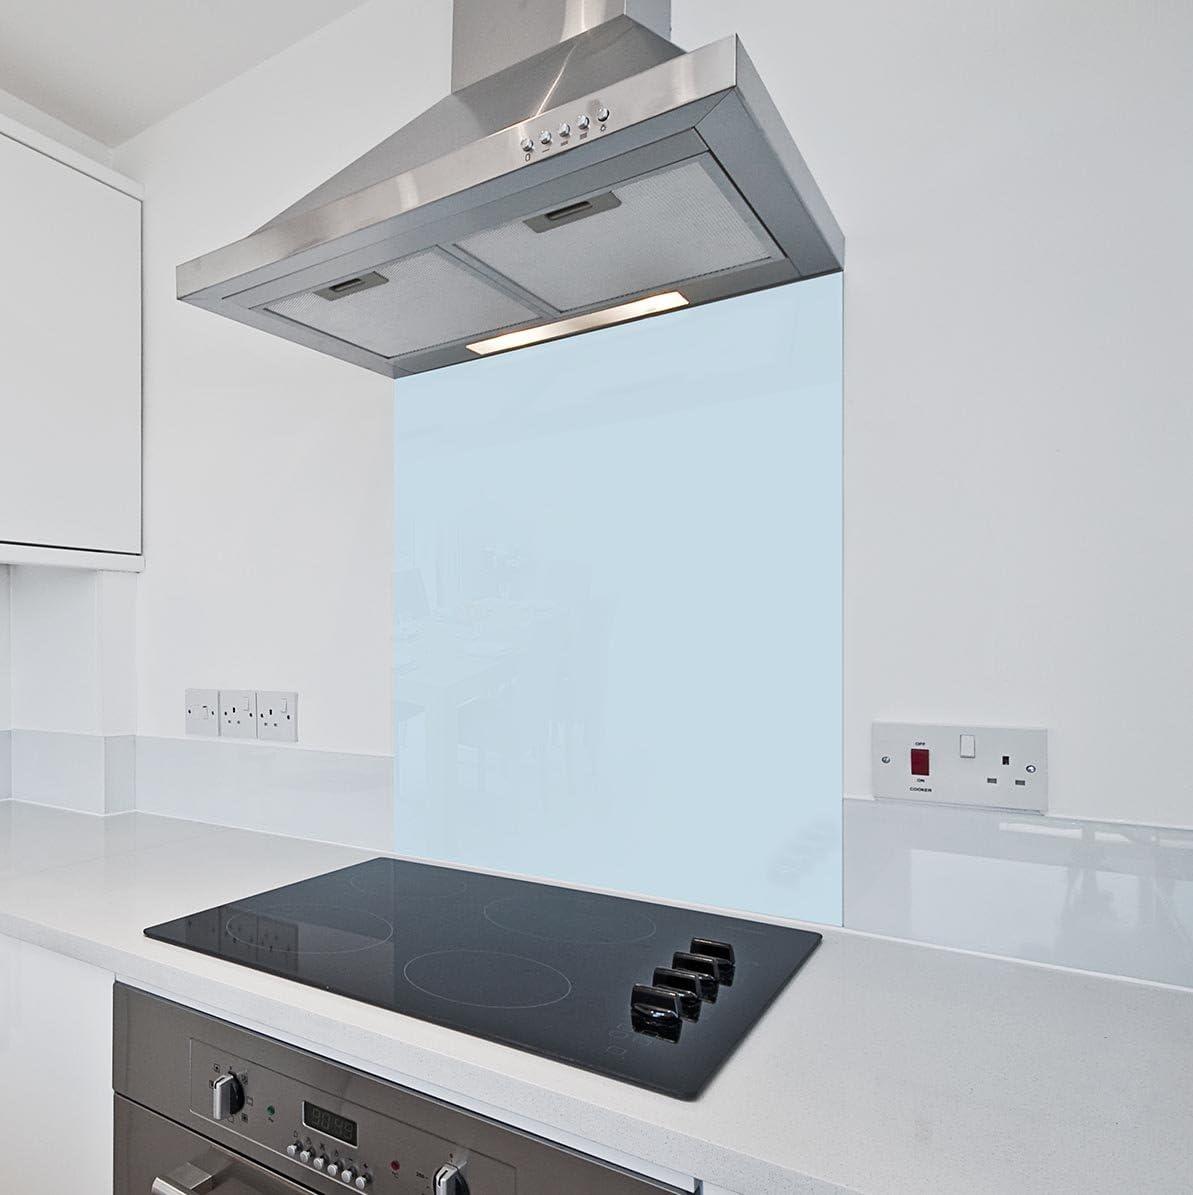 Luz azul cristal cocina Splashback por colour2glass – 6 mm de espesor resistente al calor vidrio de cocina templado Splashbacks 1100 x 750mm azul: Amazon.es: Hogar